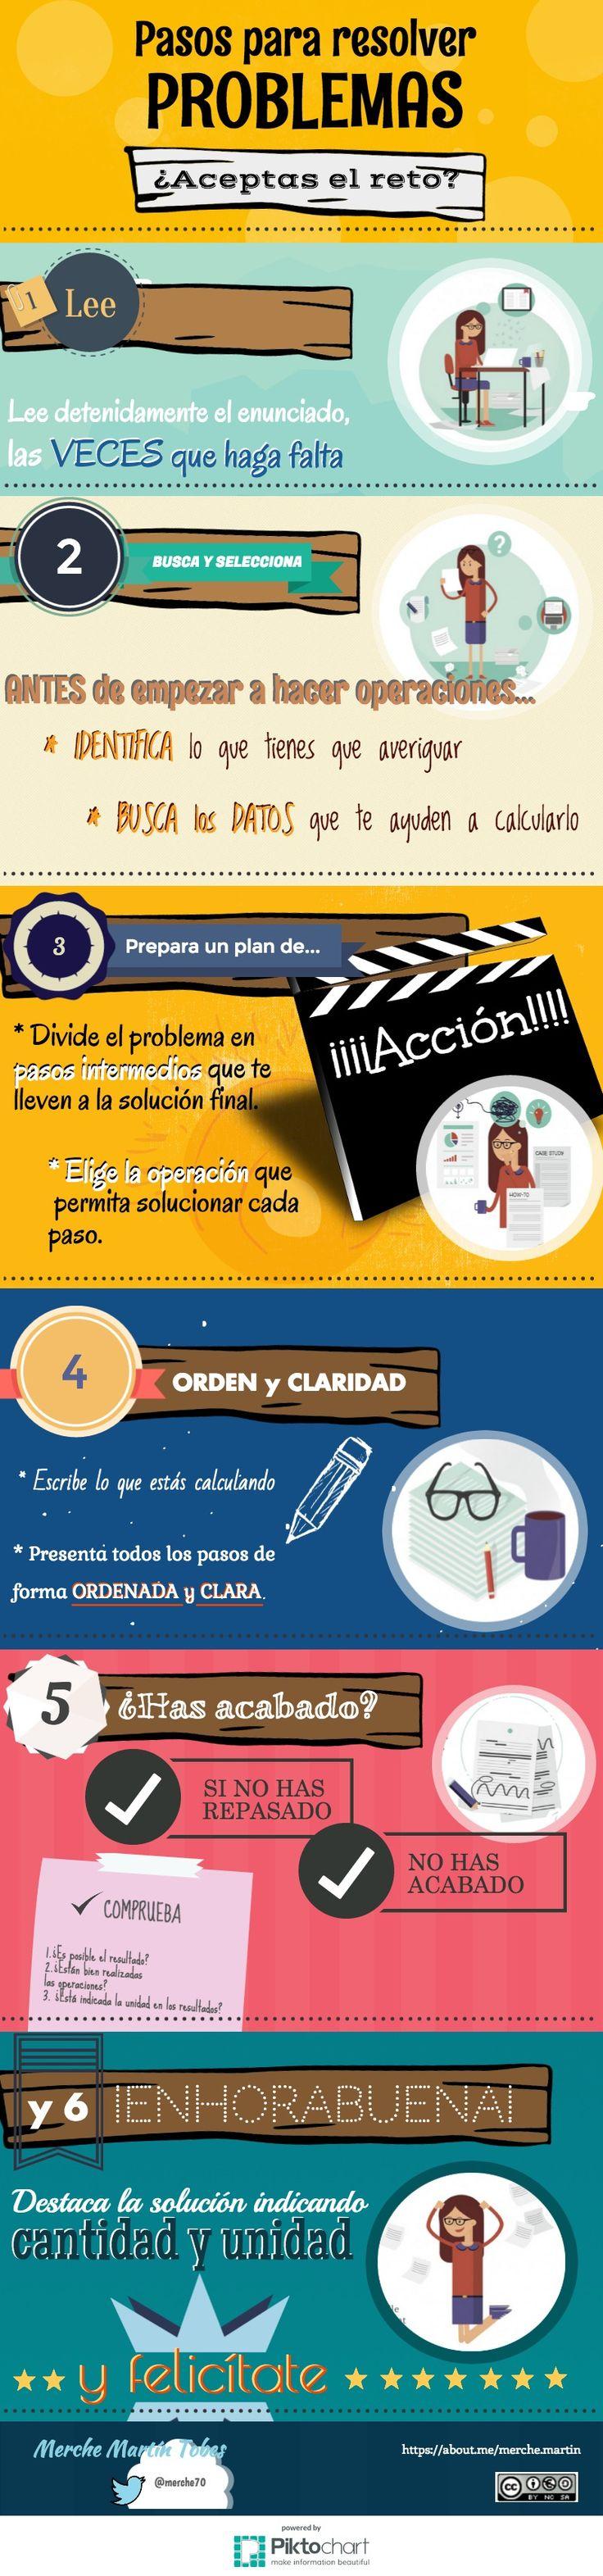 Pasos para resolver problemas   Piktochart Infographic Editor